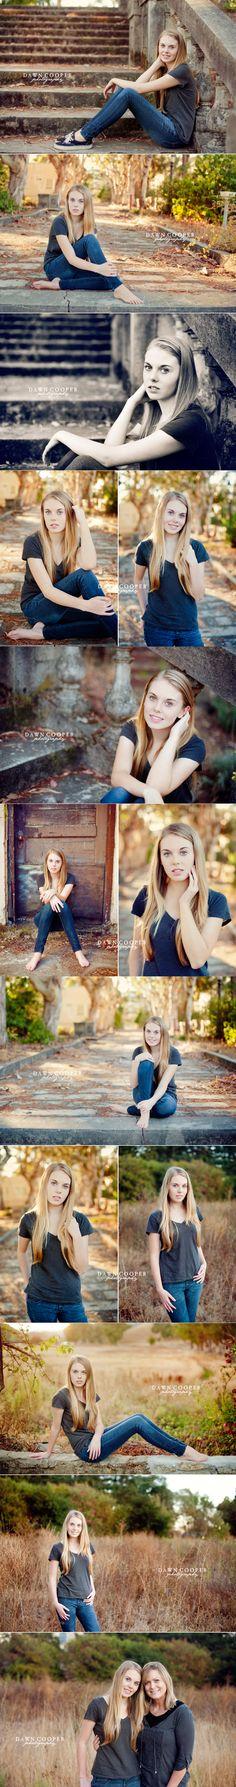 Sweet 16 | Petaluma Portrait Photographer » Dawn Cooper Photography